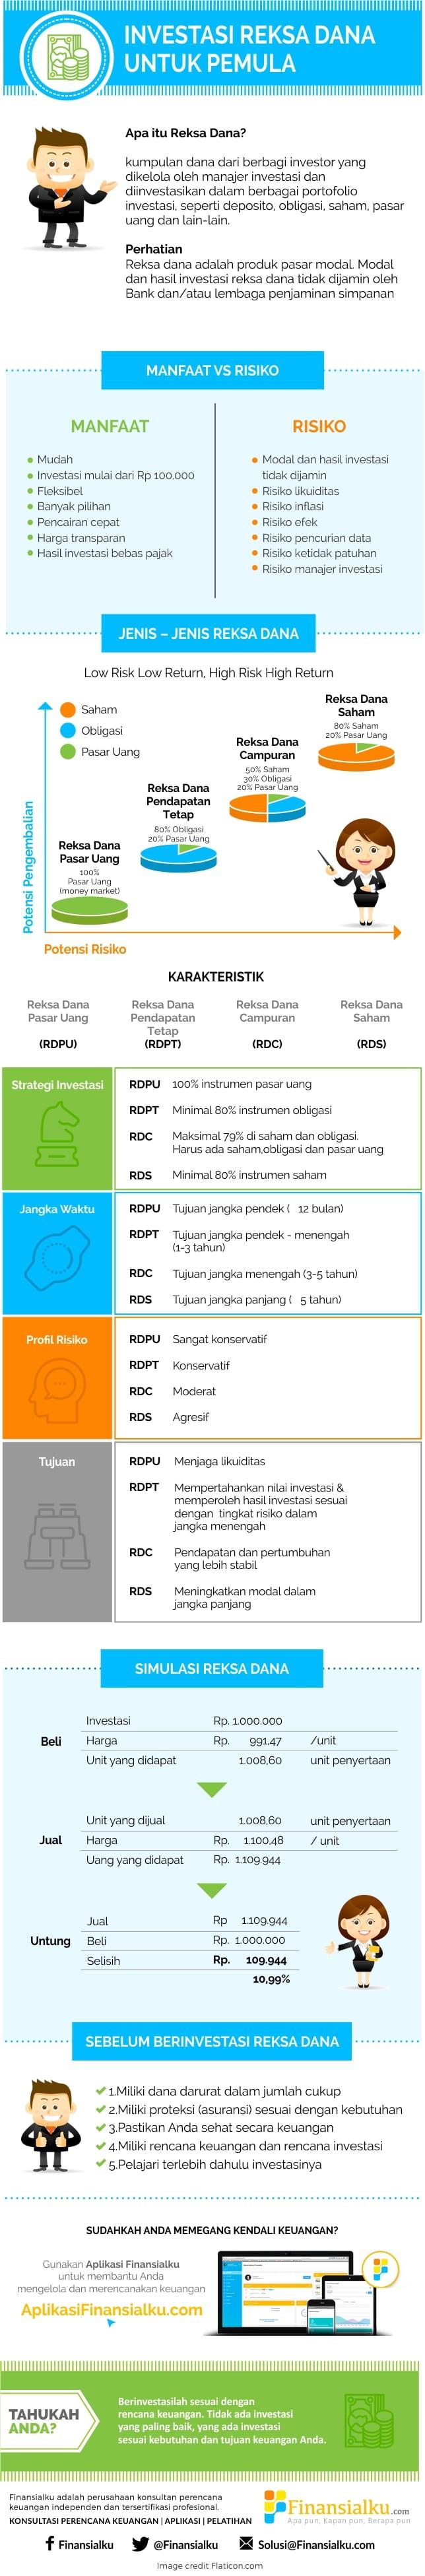 infografis-mengenal-reksa-dana-untuk-pemula-finansialku